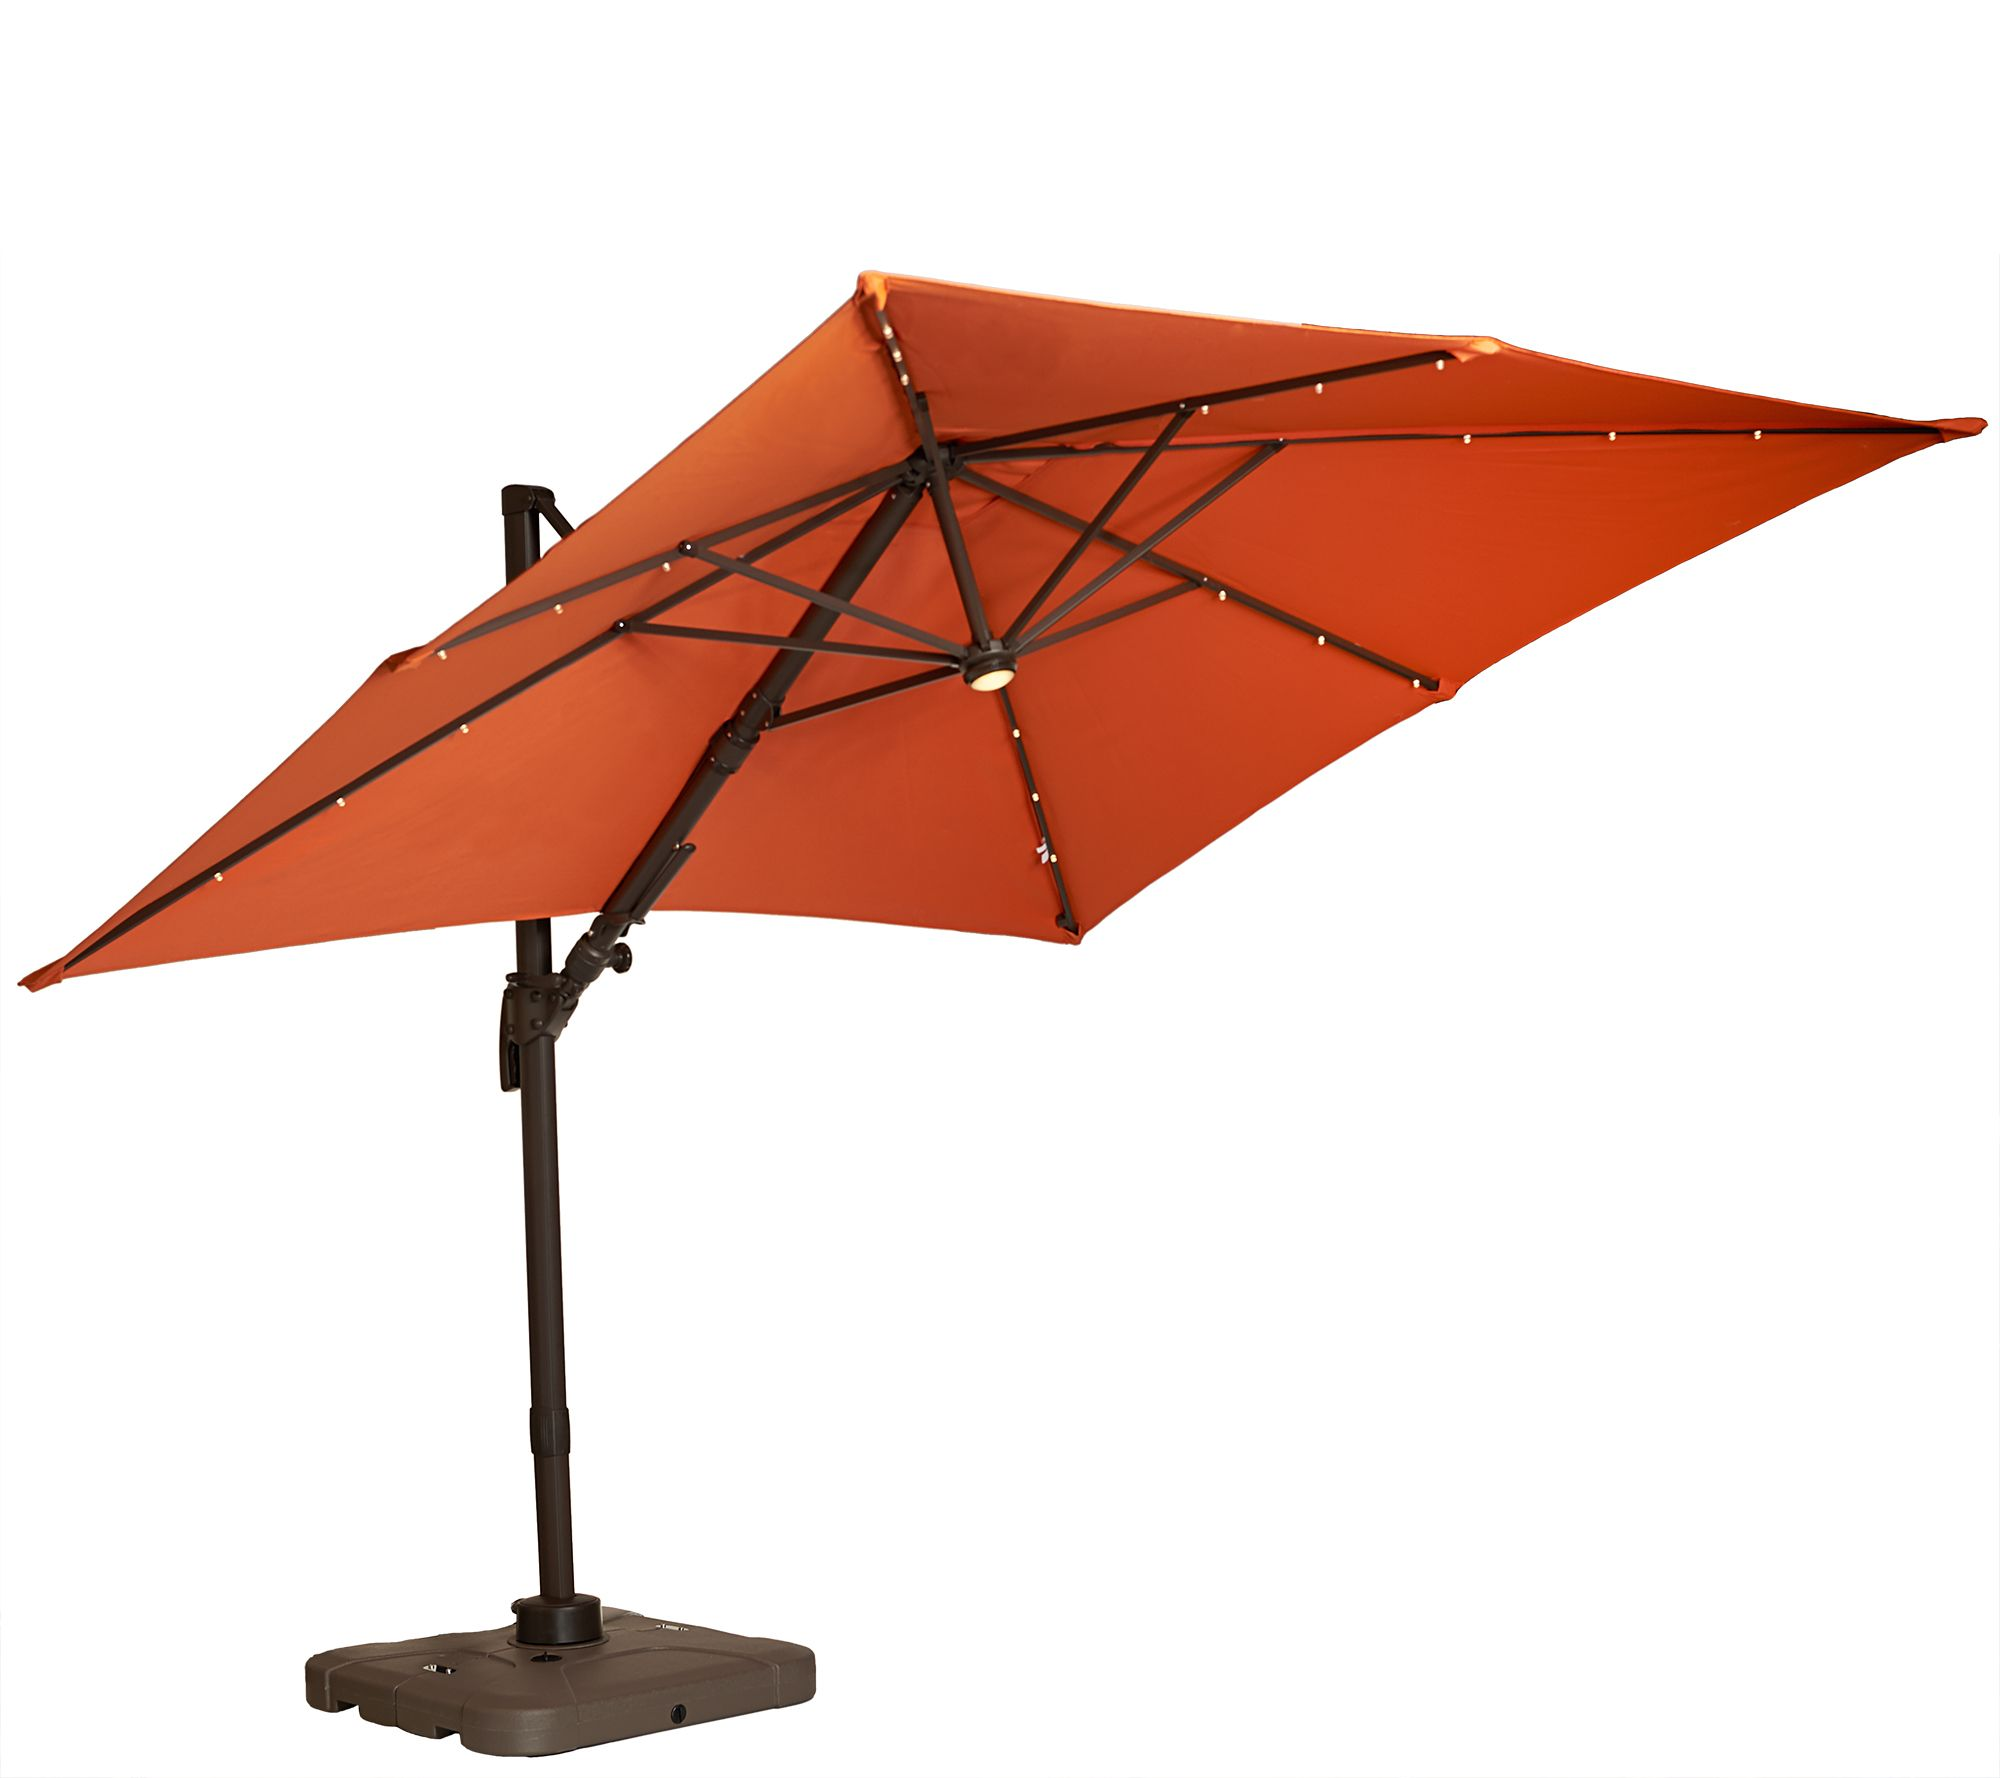 ATLeisure MultiTilt 85 Solar Offset Patio Umbrella Page 1